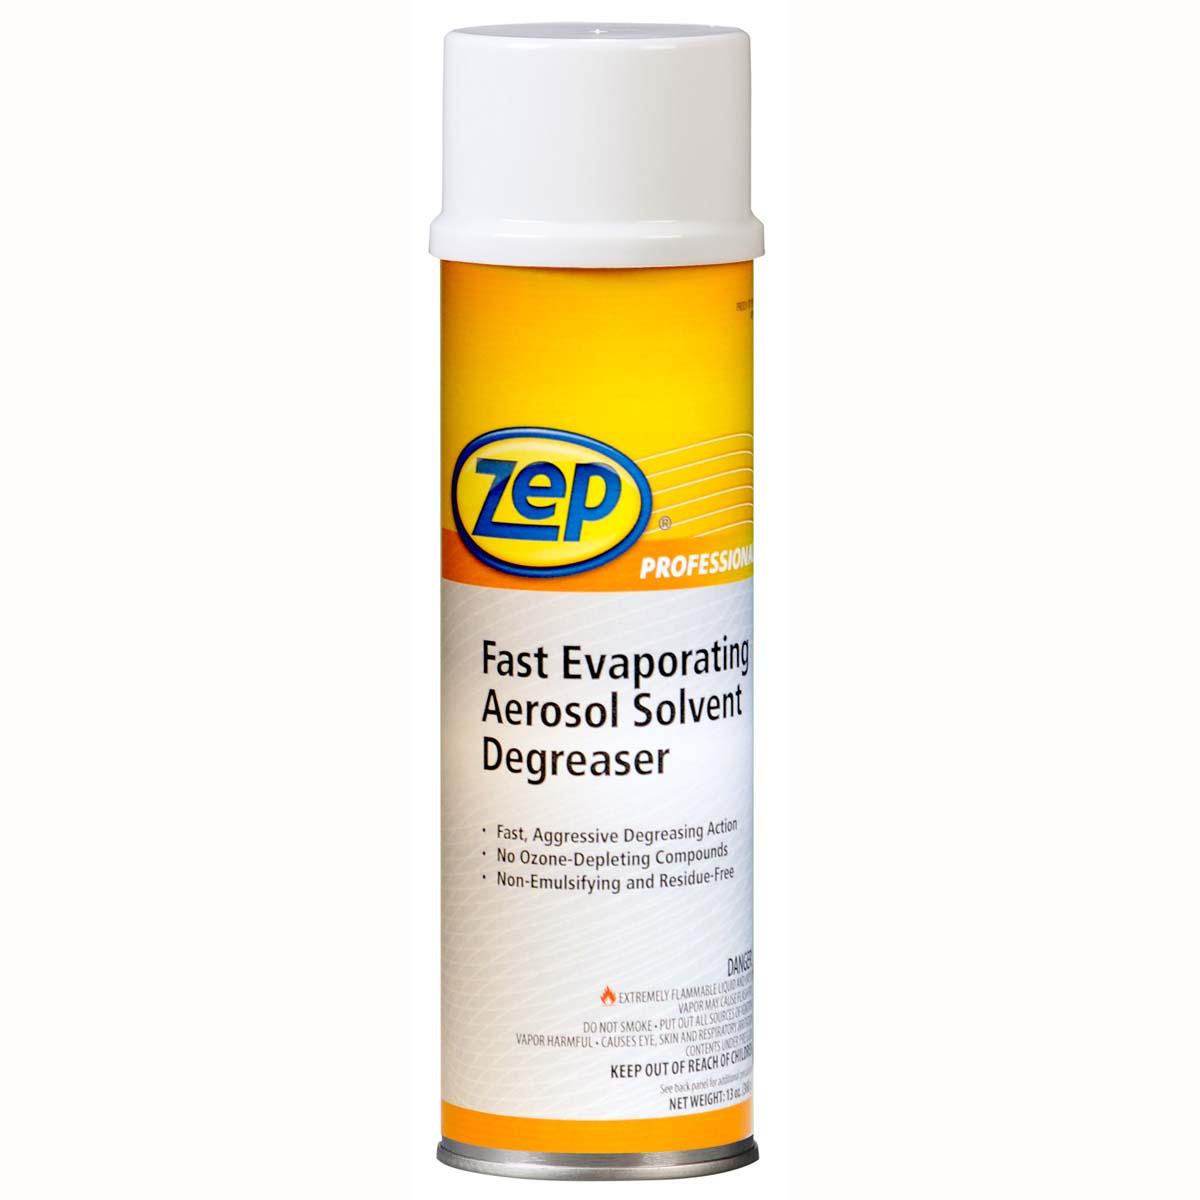 ZEP Fast-Evaporating-Aerosol-Solvent-Degreaser